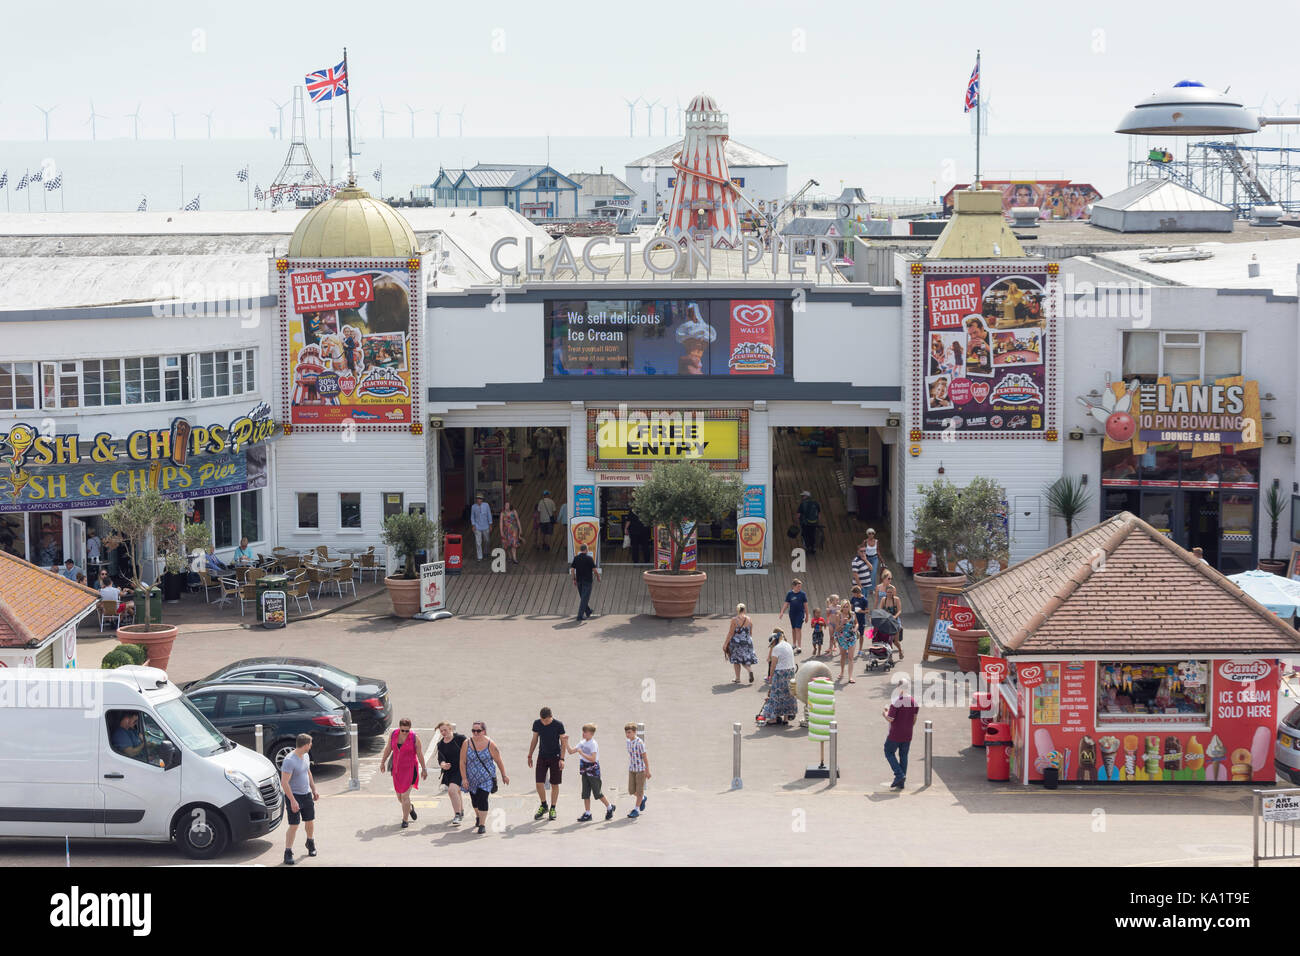 Entrance to Clacton Pier, Clacton-on-Sea, Essex, England, United Kingdom - Stock Image